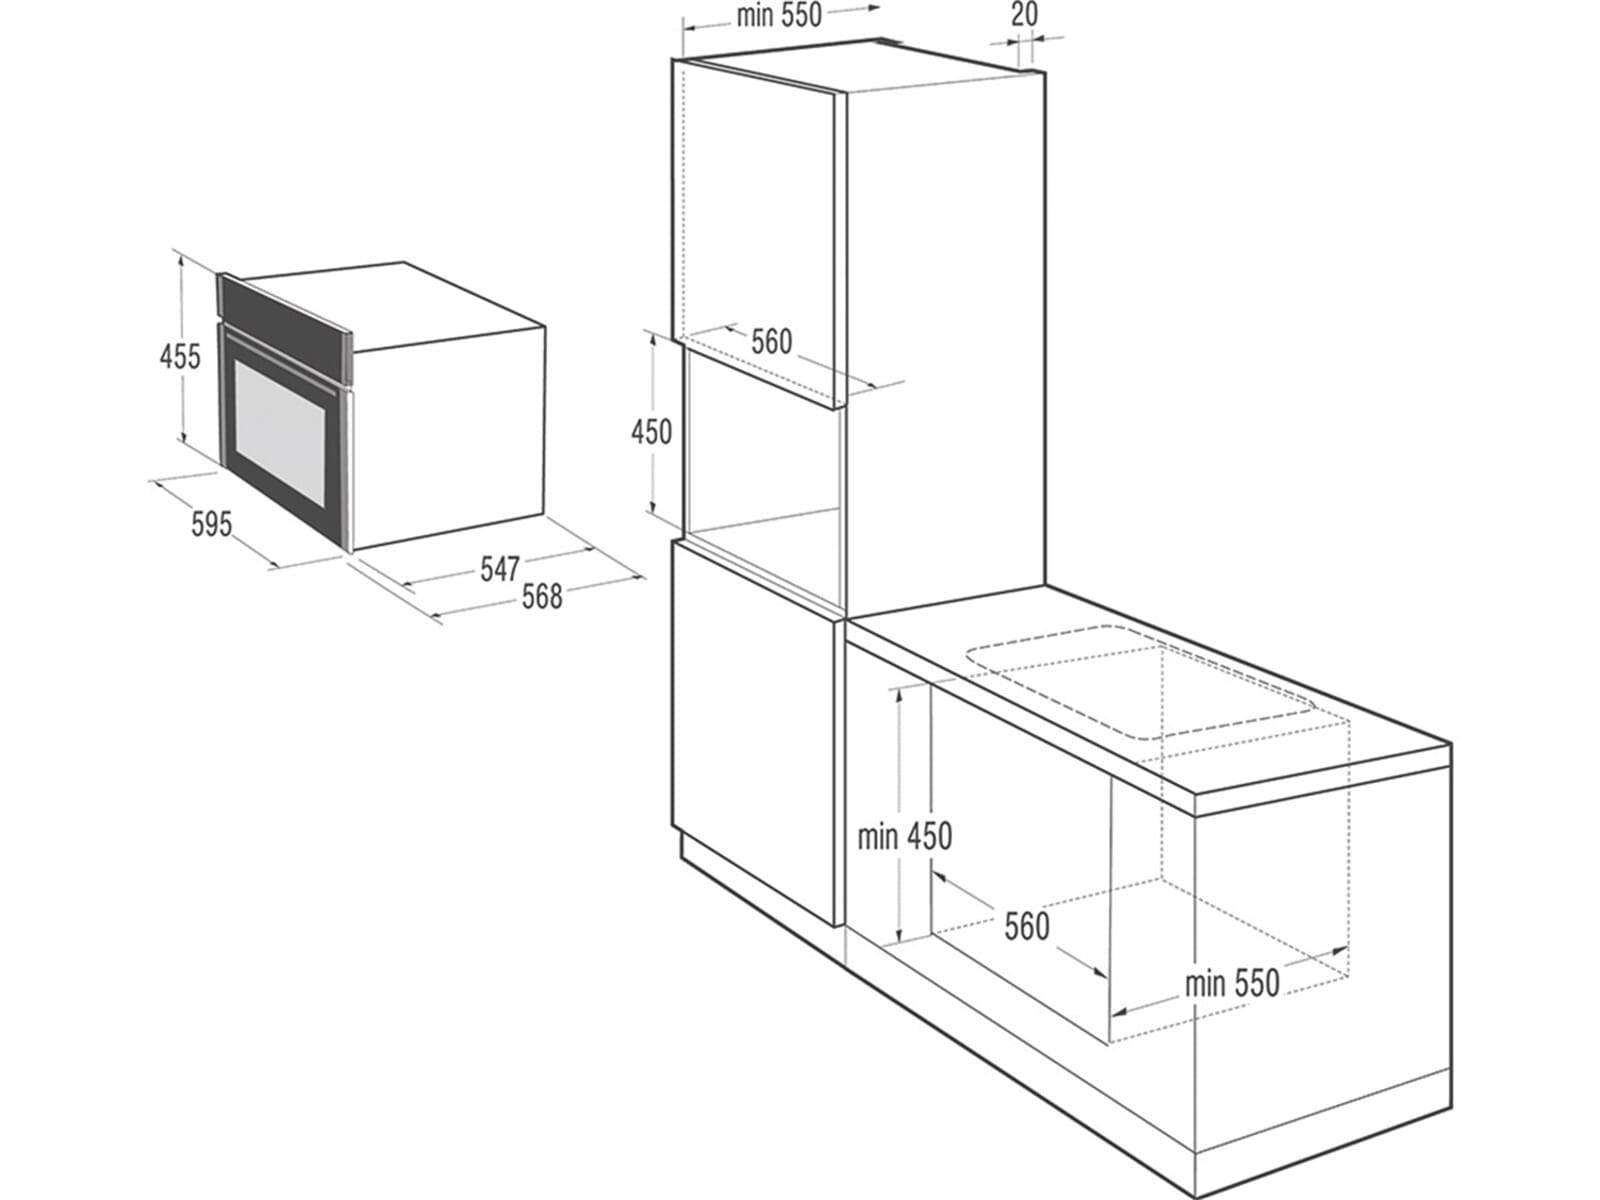 Gorenje BCM 547 S12X Kompakt Backofen mit Mikrowelle Edelstahl